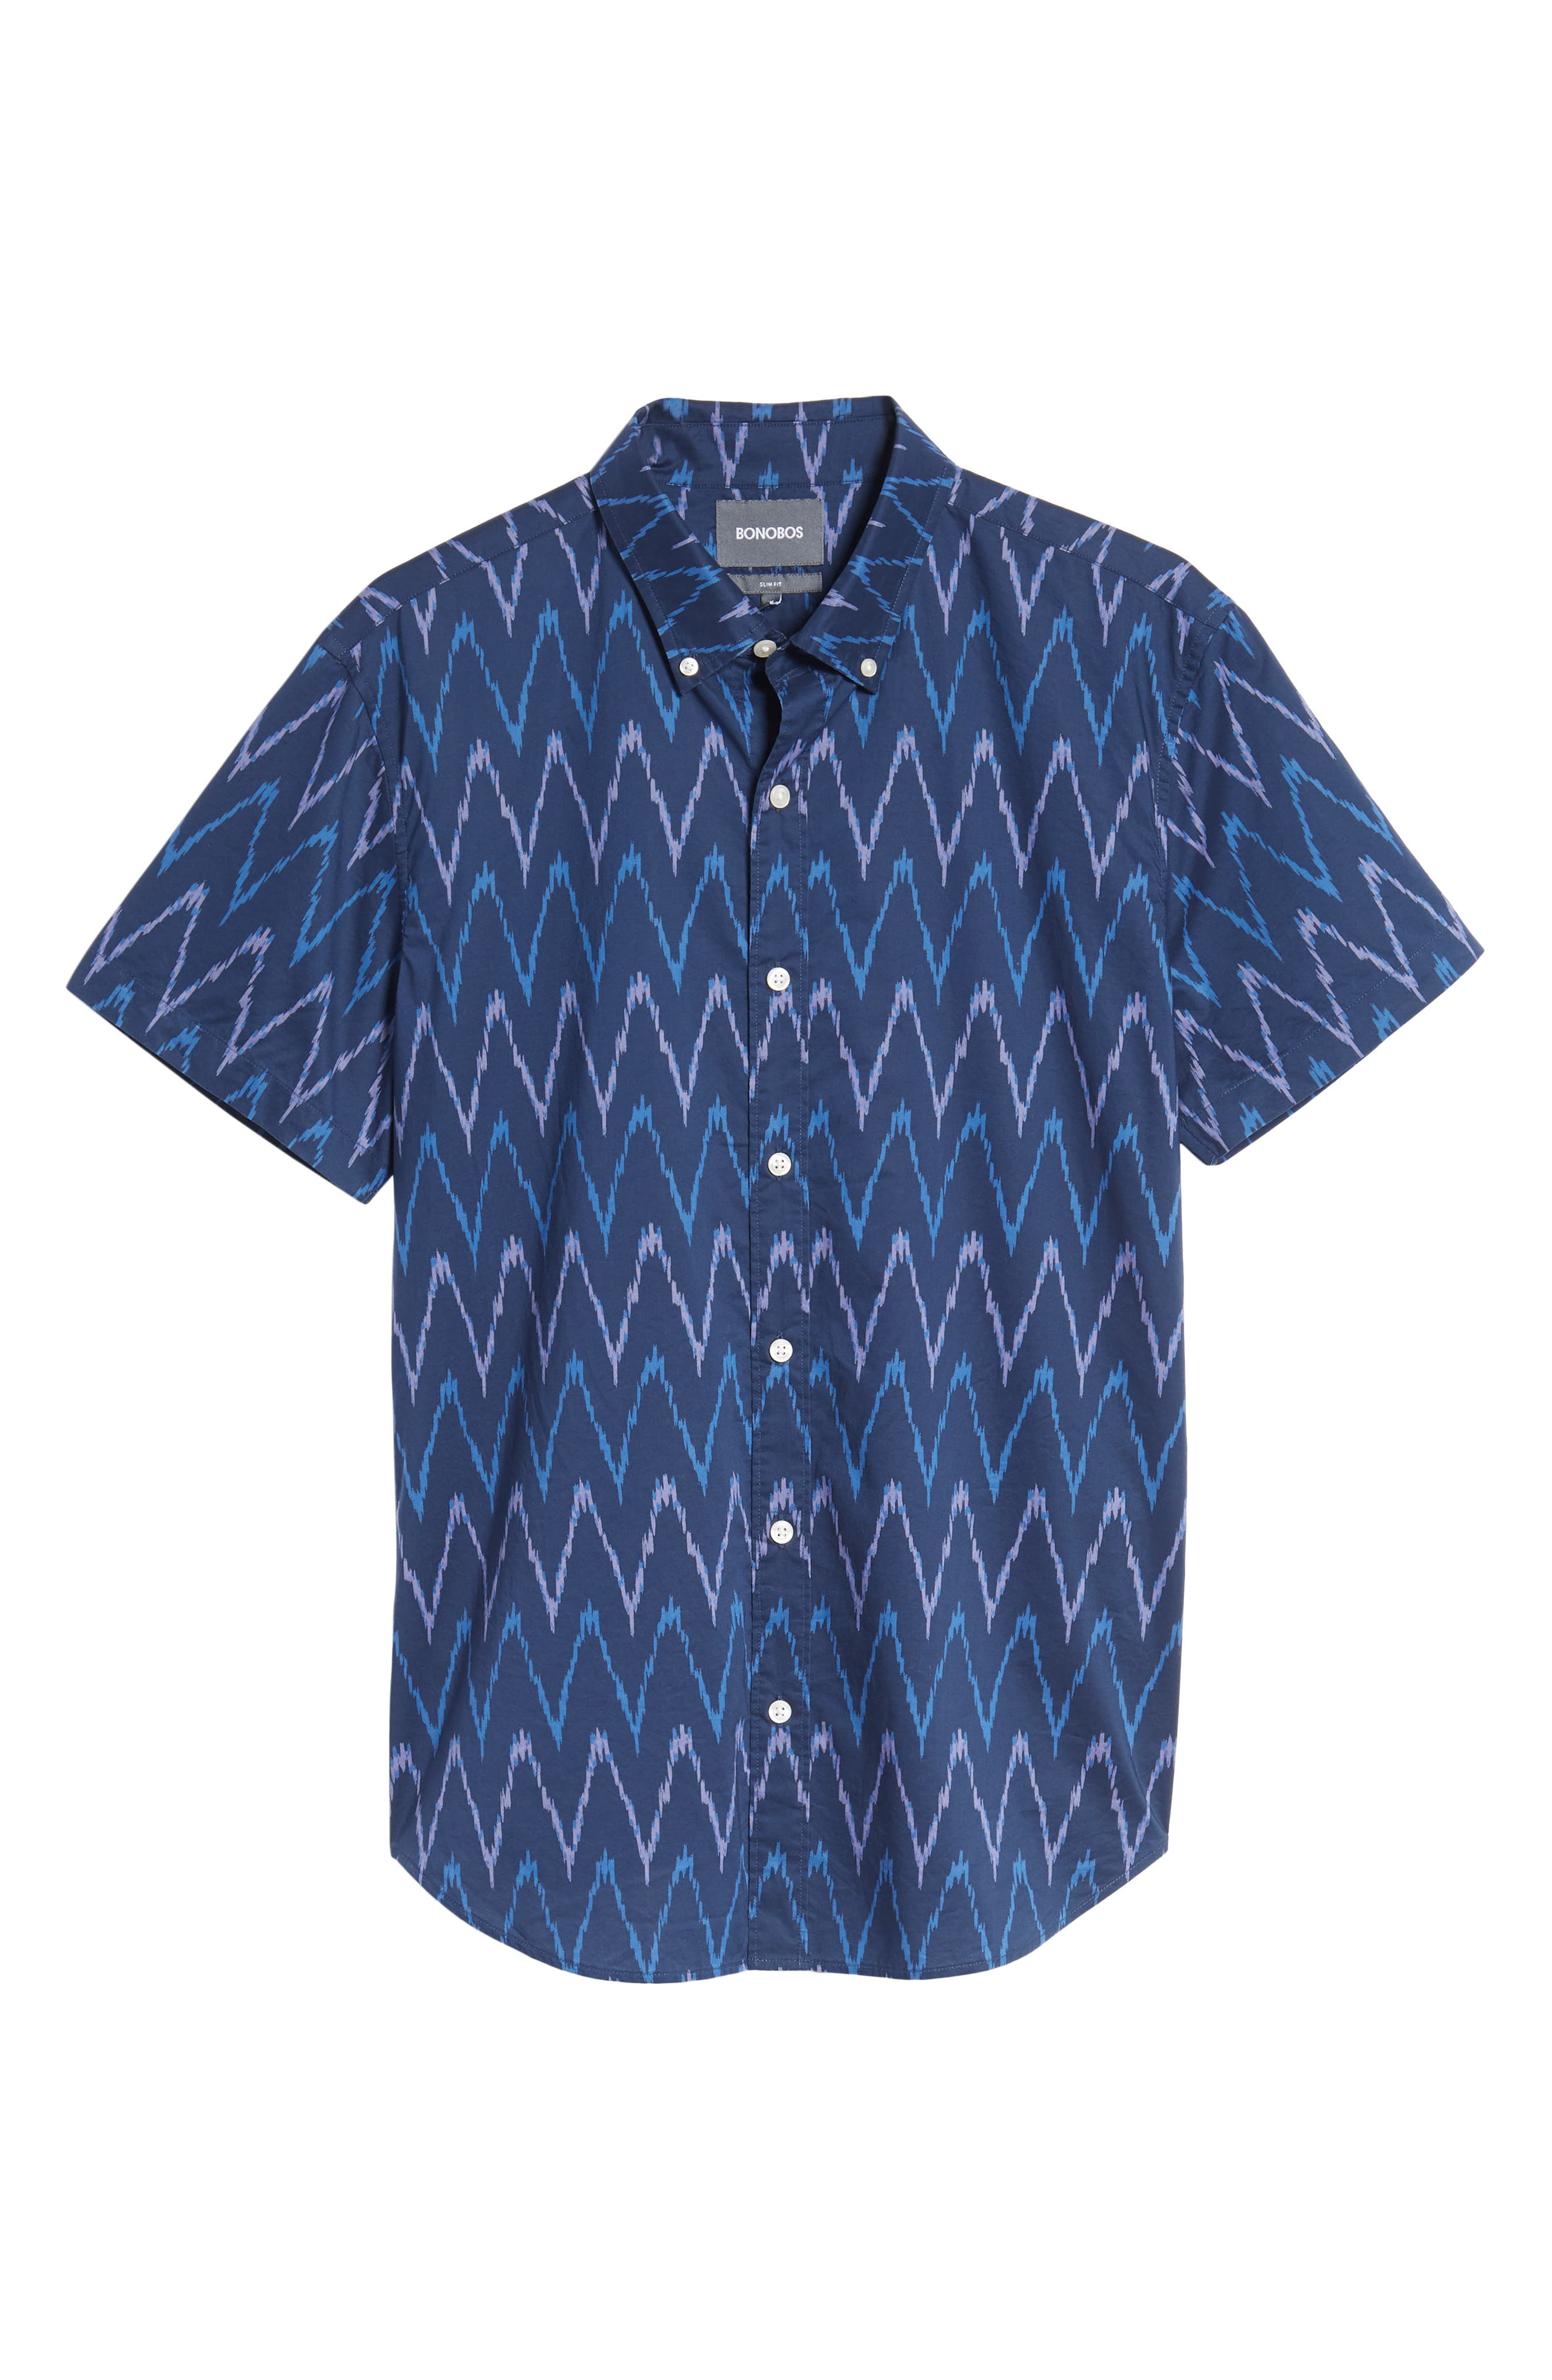 Riviera Slim Fit Ikat Print Sport Shirt,                             Alternate thumbnail 6, color,                             PRINTED IKAT - DEEP PACIFIC